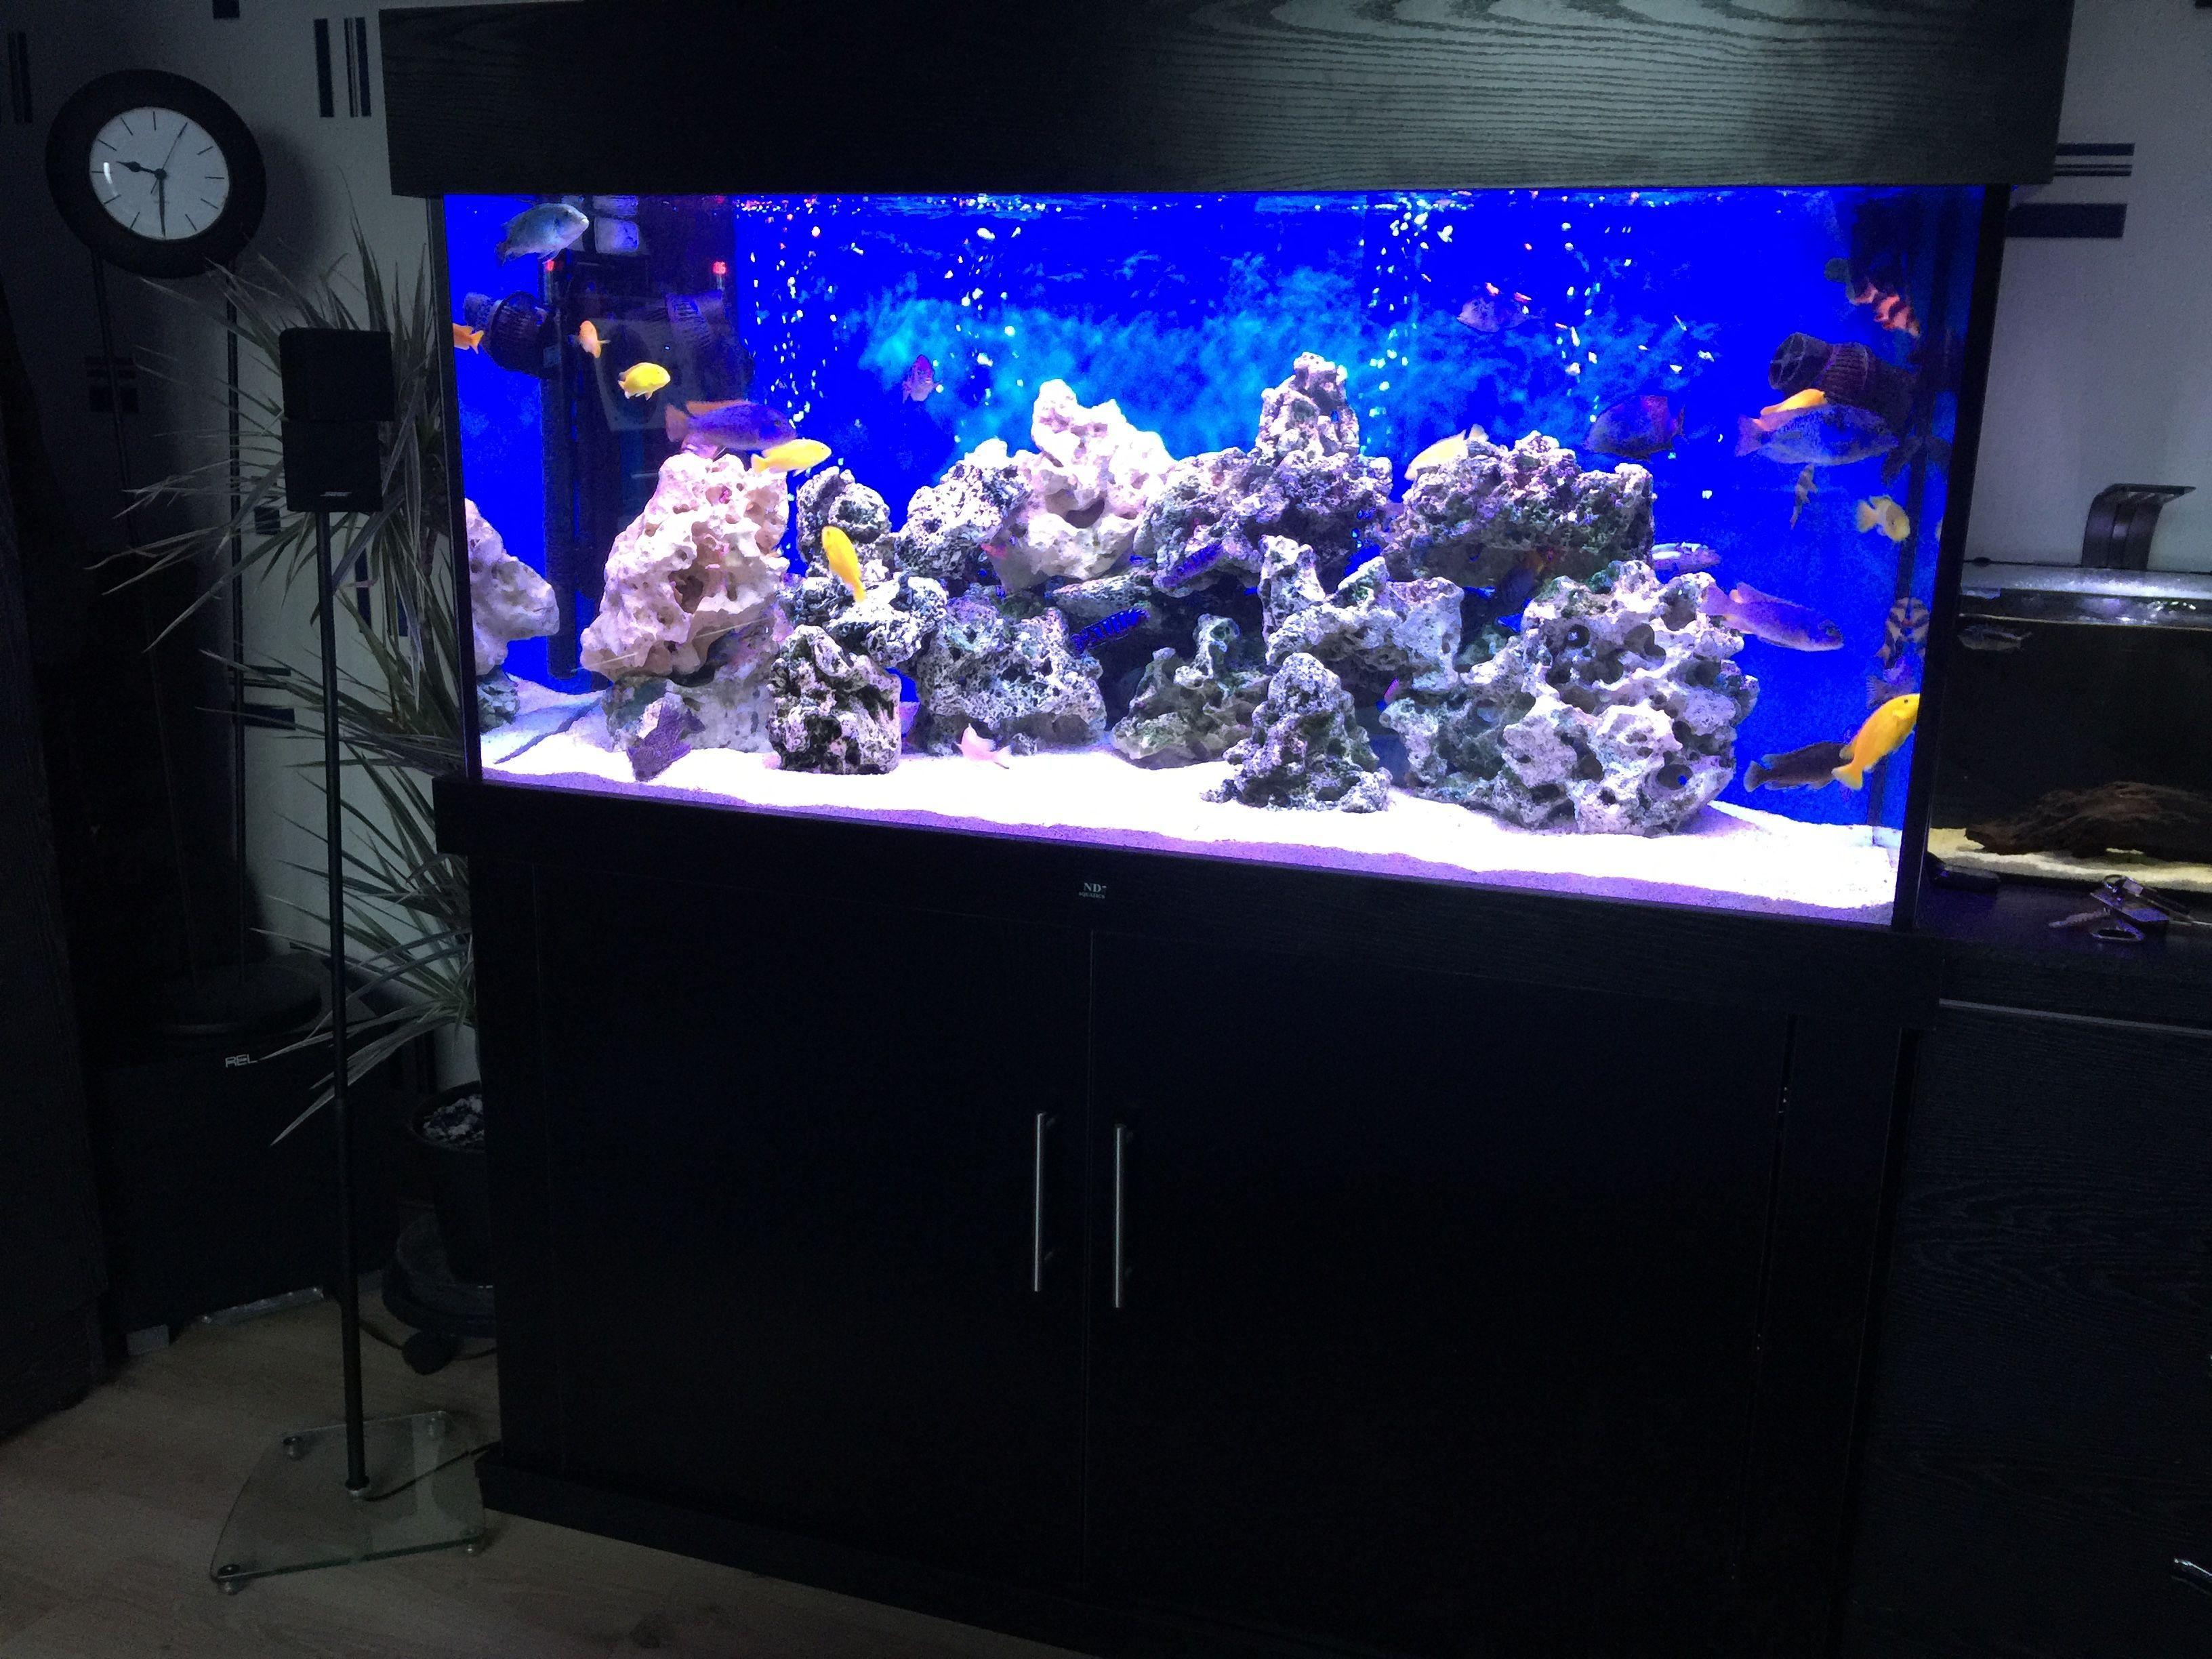 48 x 24 x 24 marine fish tank with cabinet made by nd aquatics